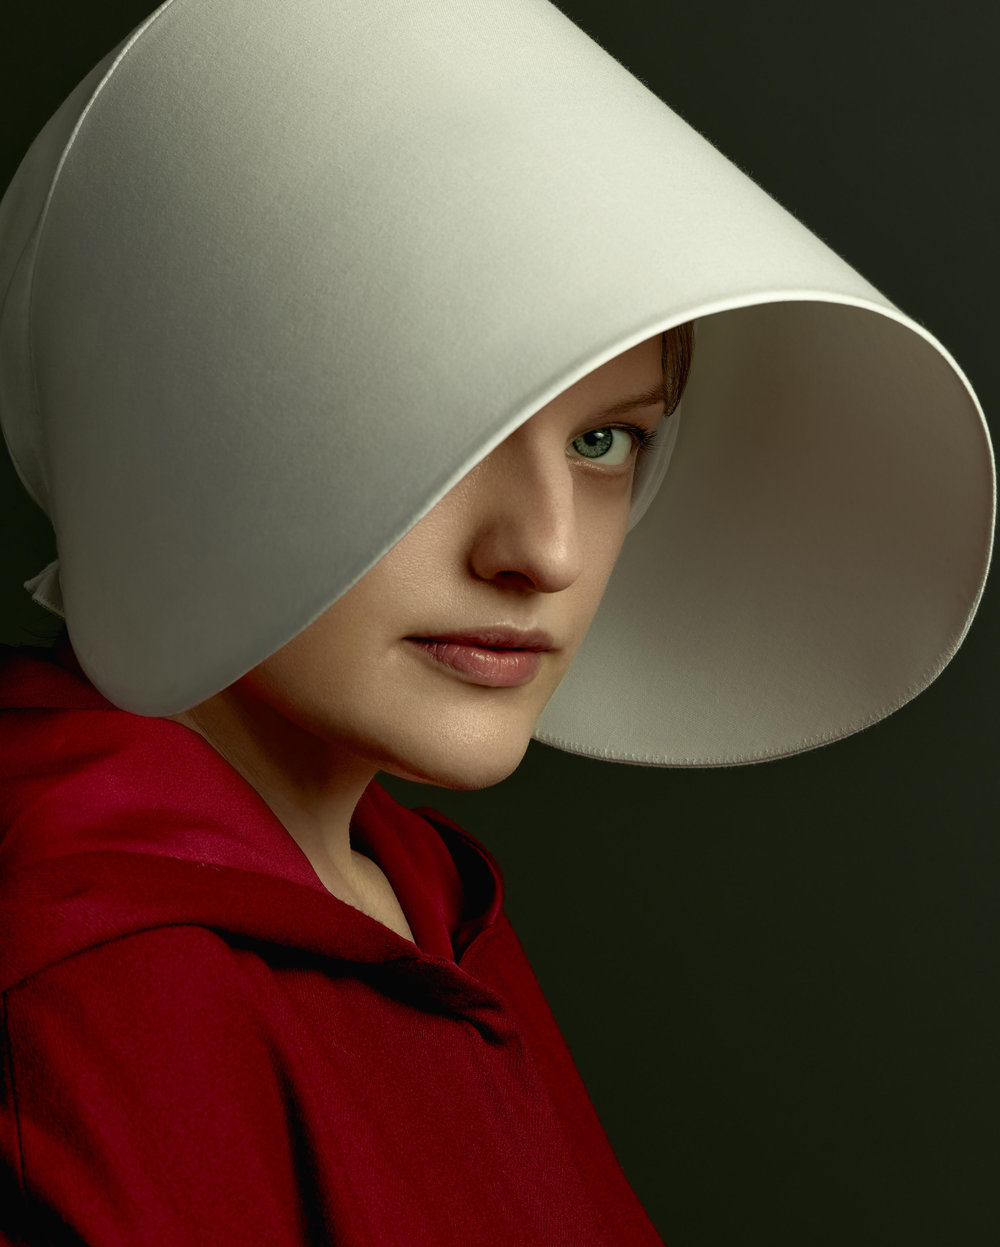 Elisabeth Moss in Handmaid's Tale